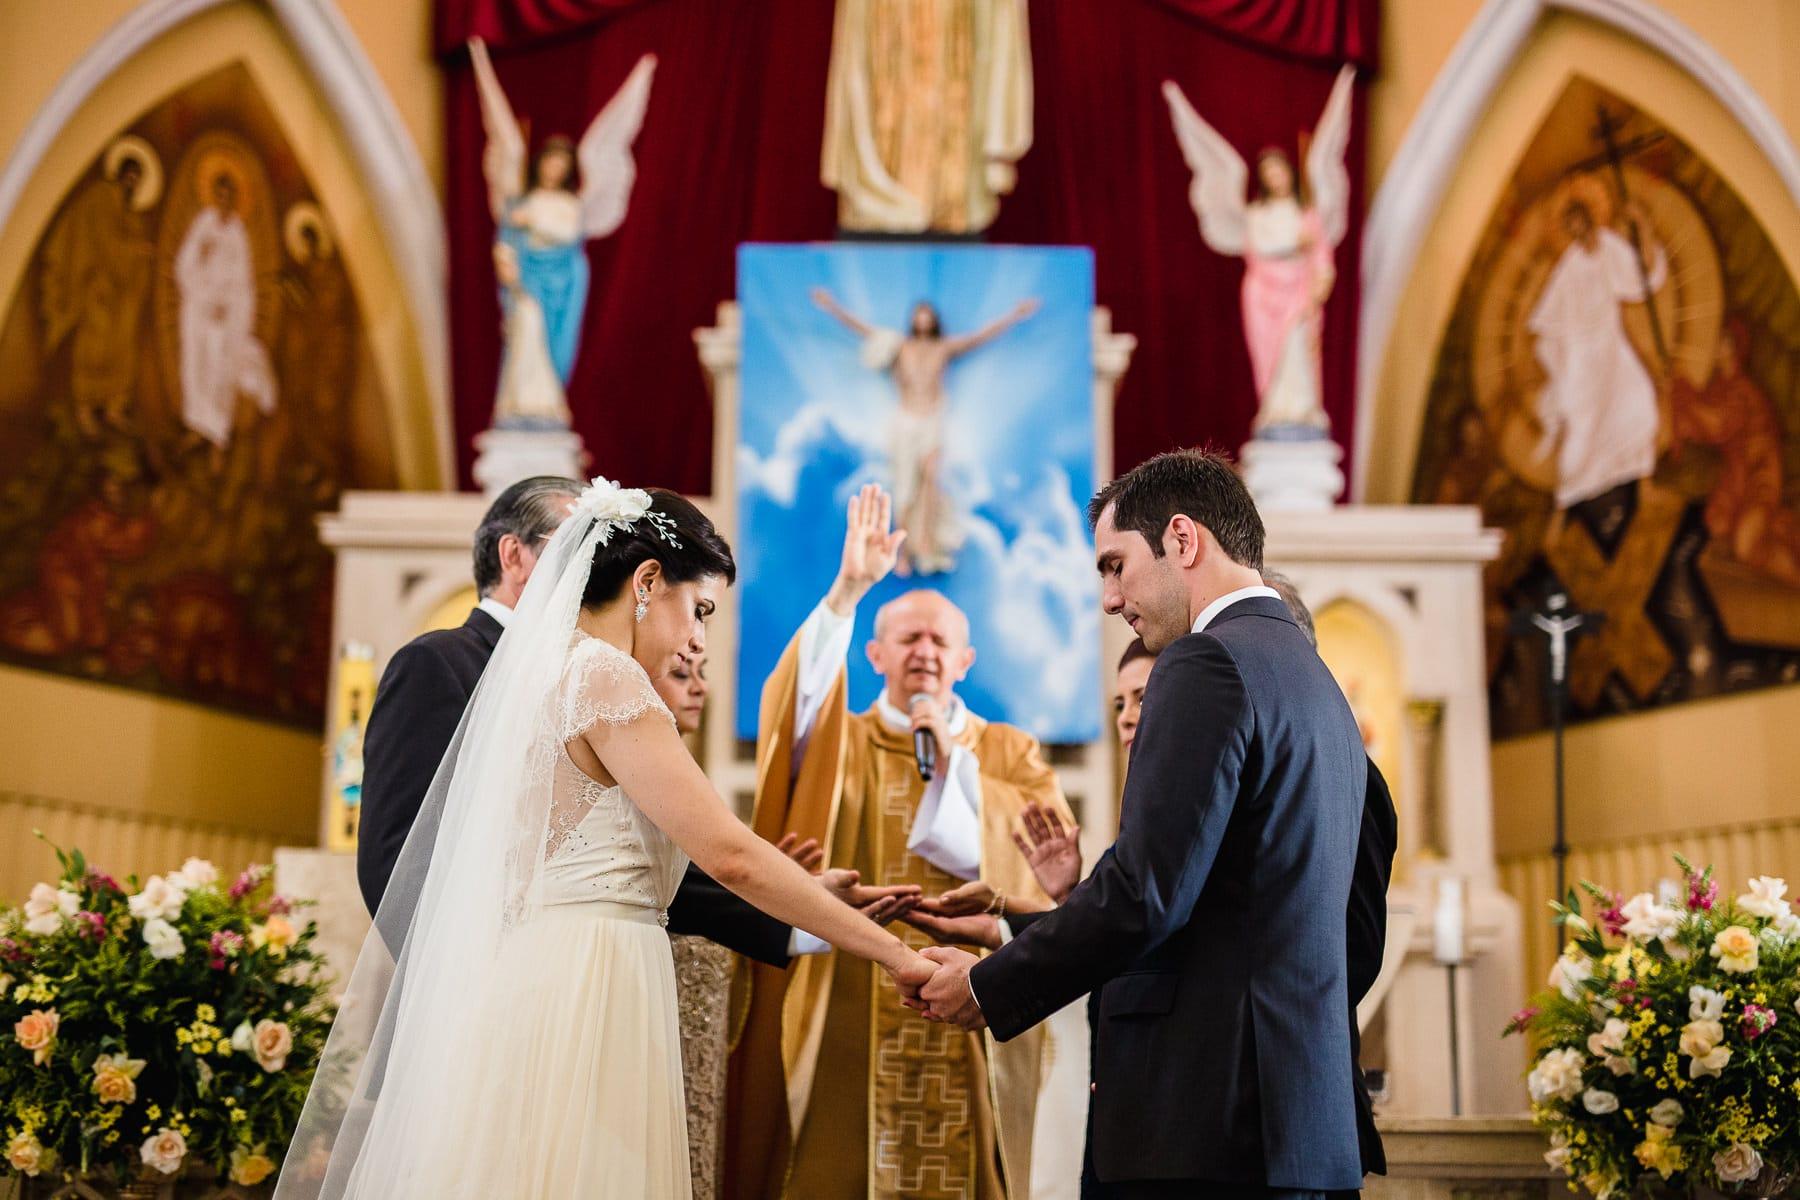 casamento-igreja-do-cristo-rei-fortaleza-45